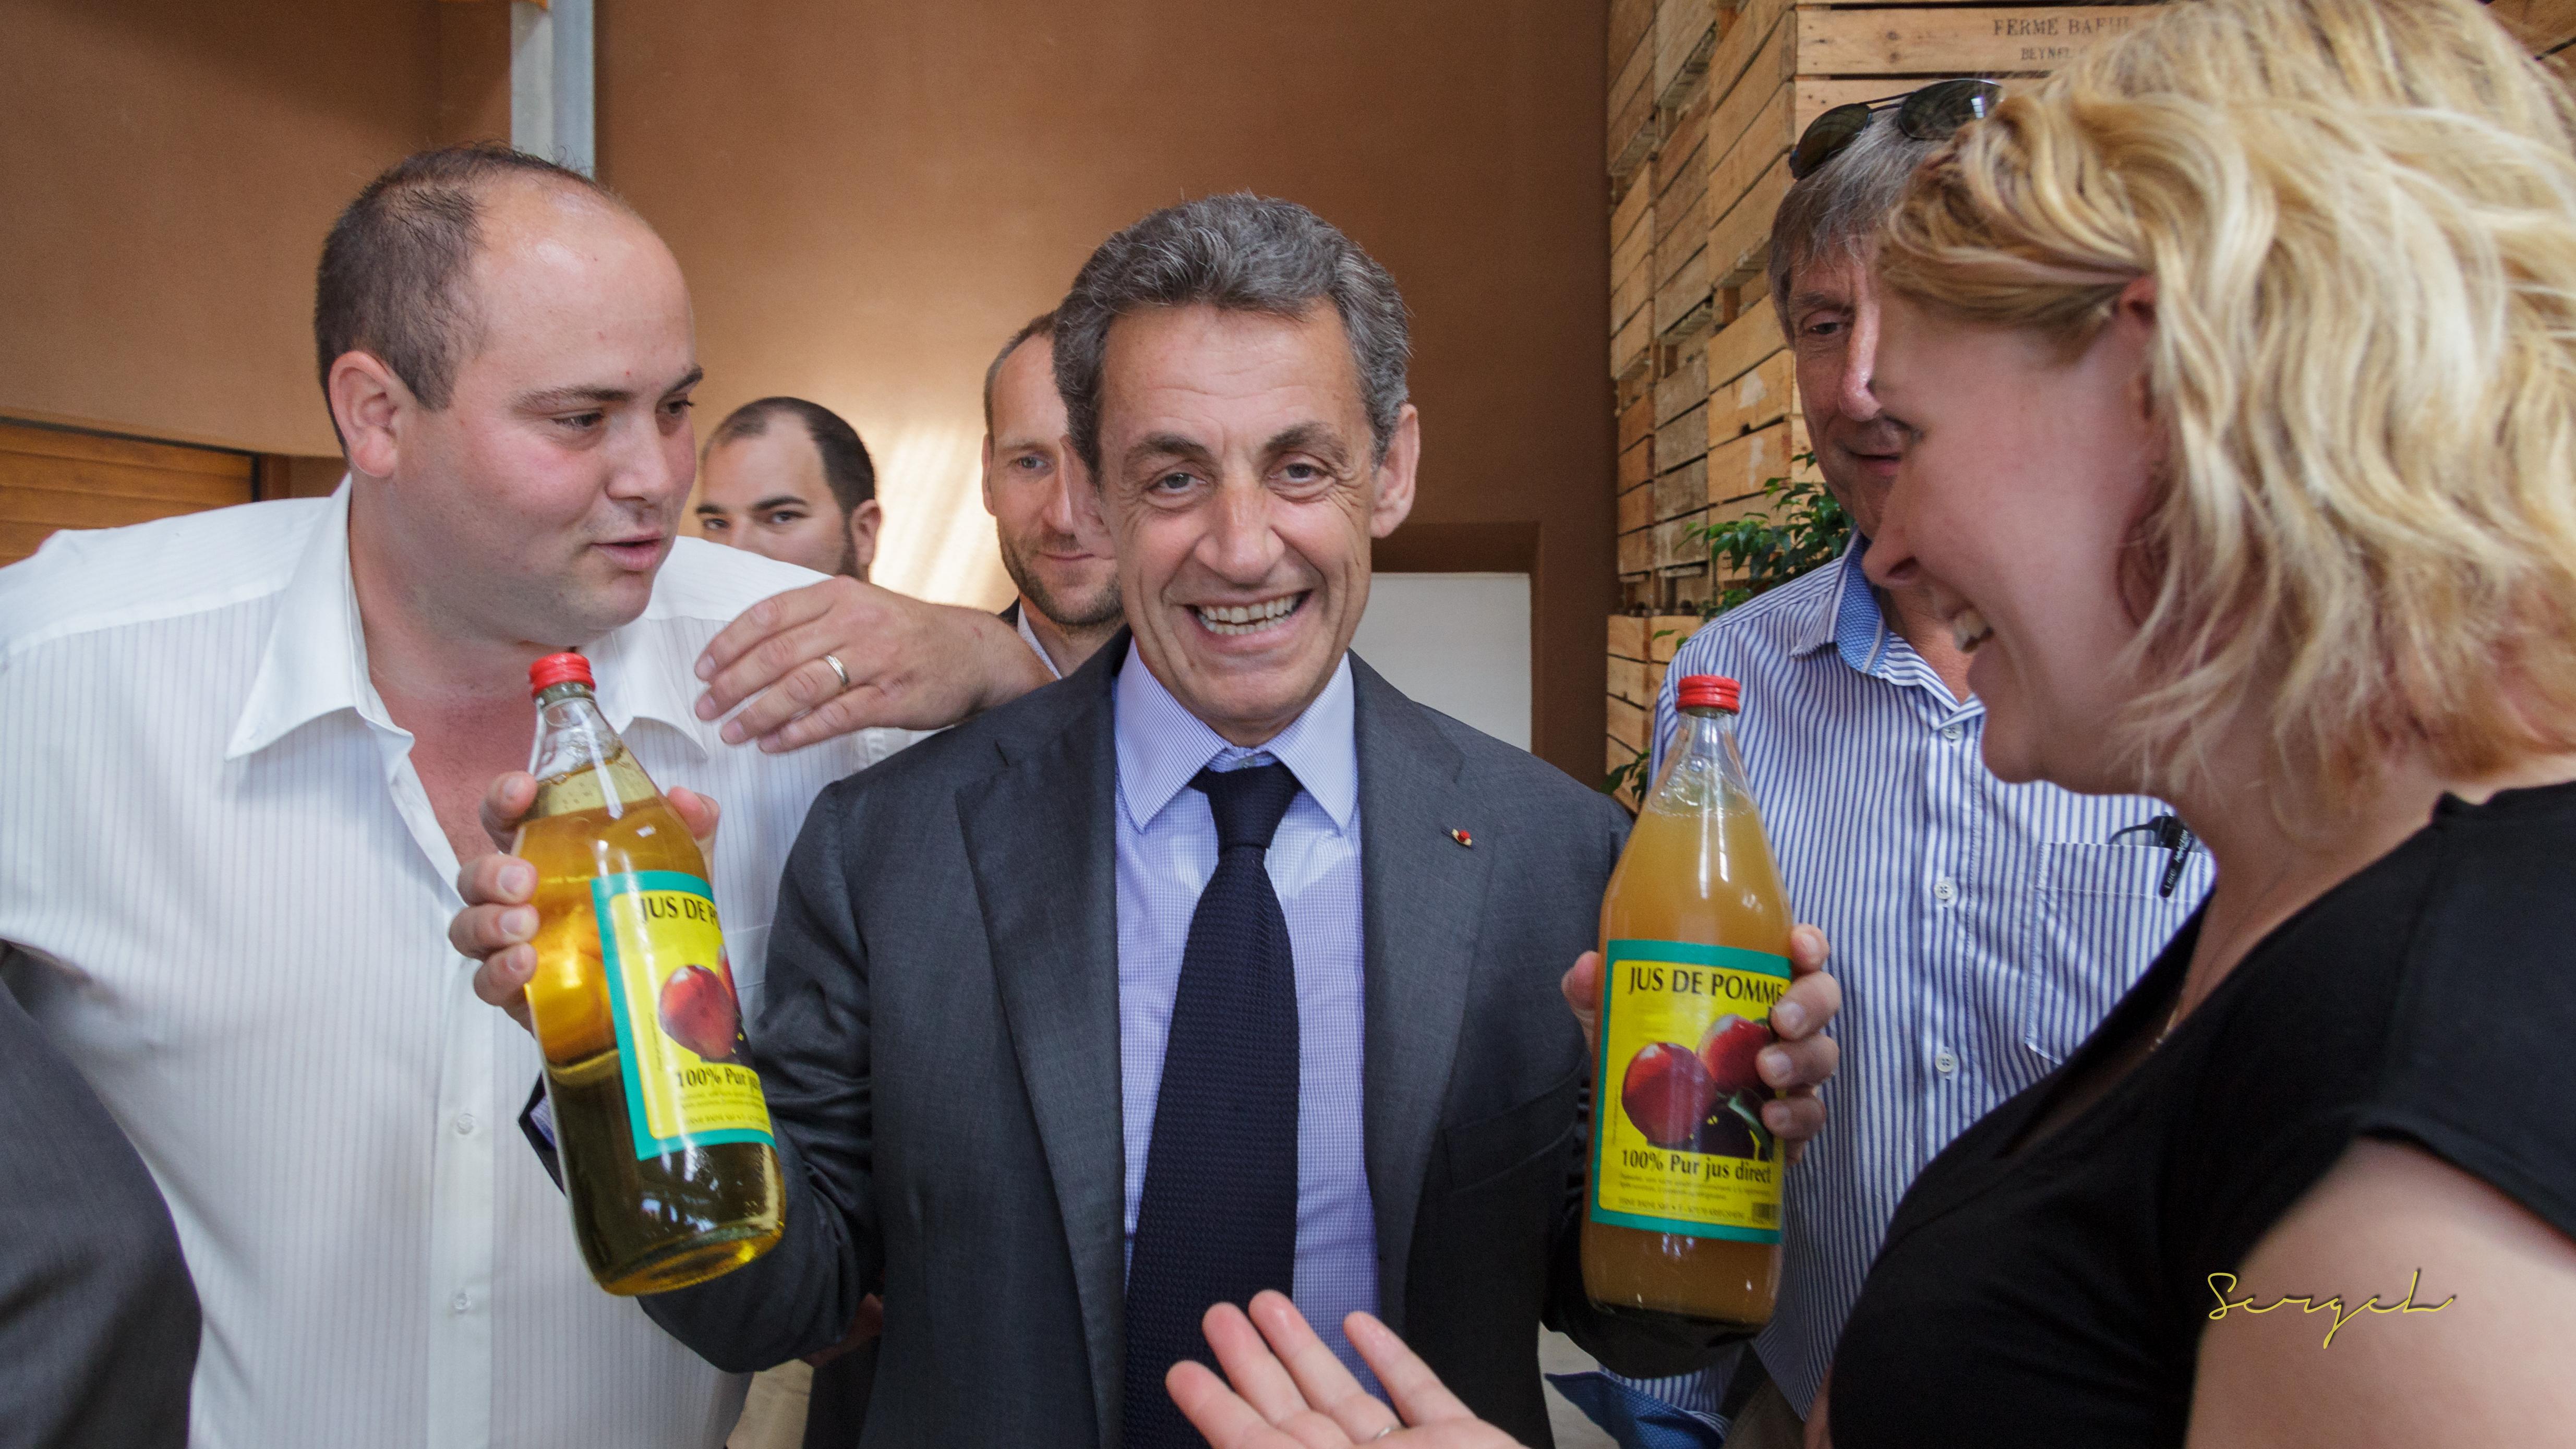 2016-07-09_12-29-55.357_Kriegsheim_Ferme_Baehl_Sarkozy